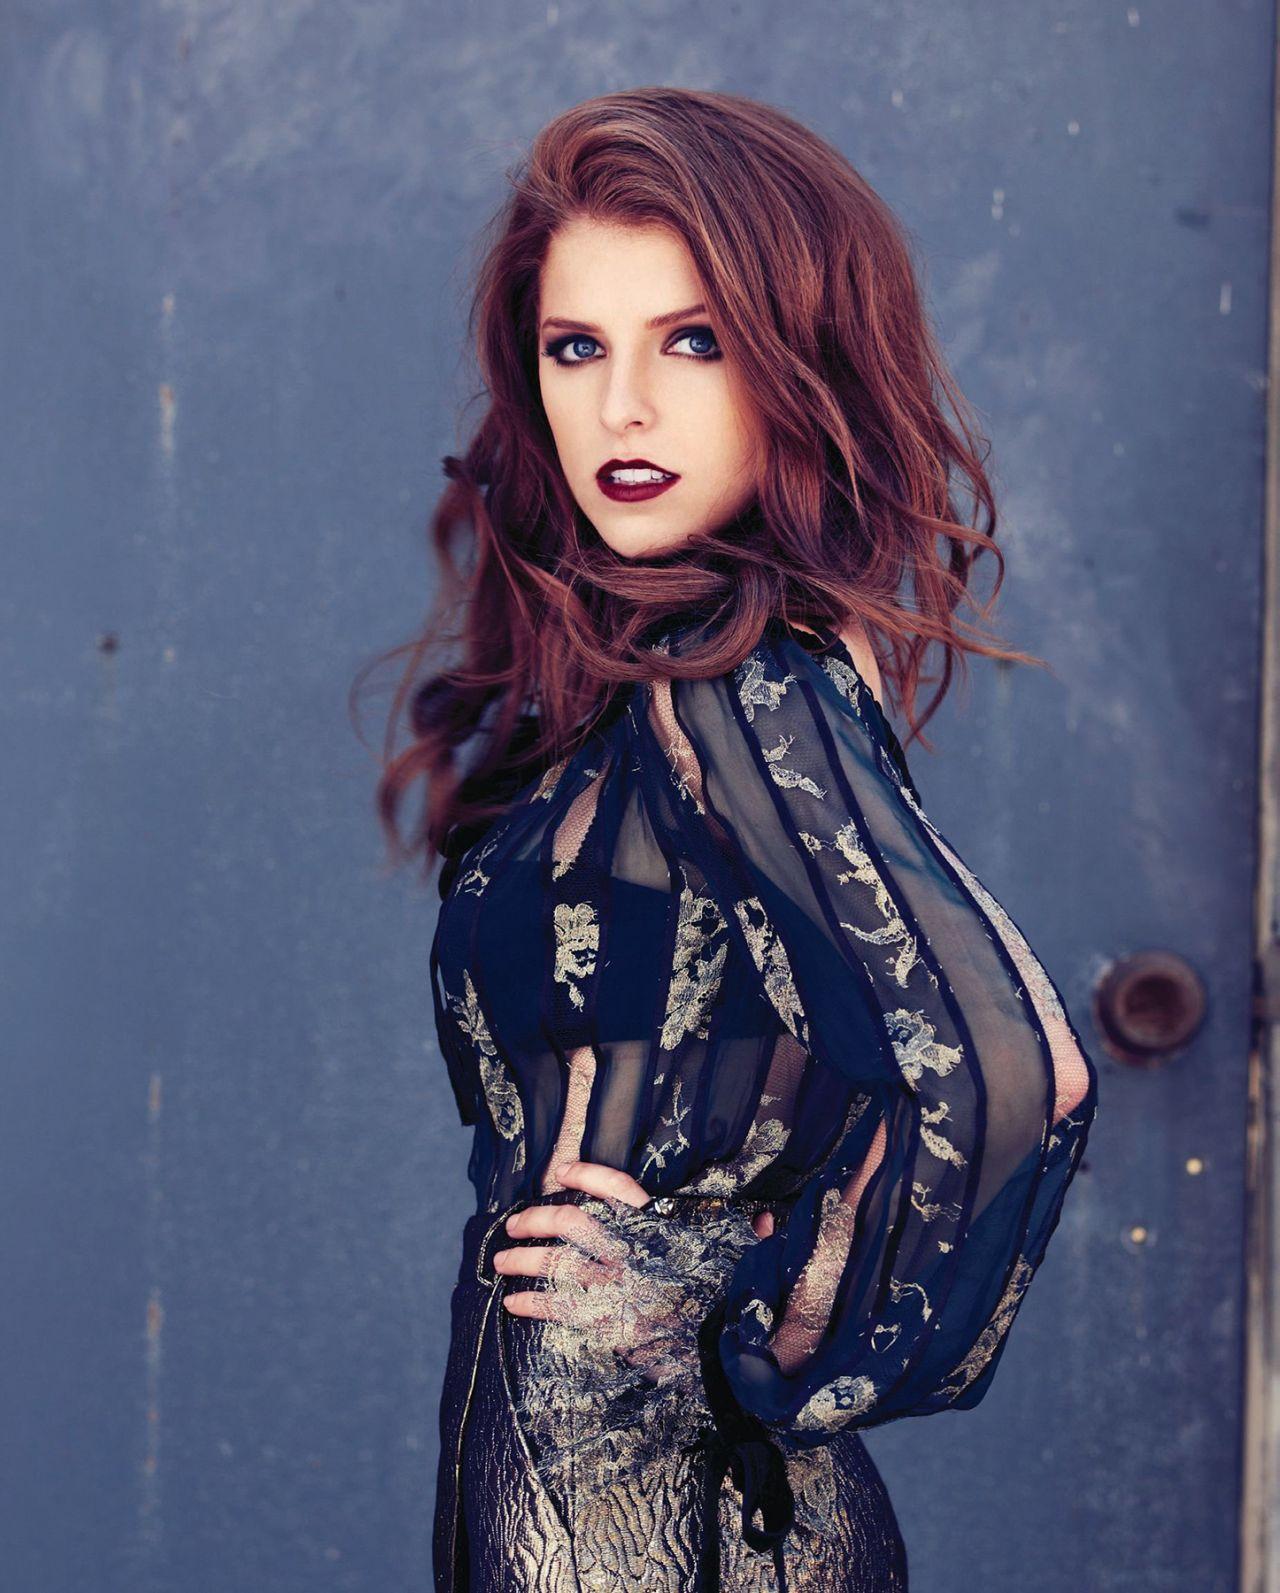 Anna Kendrick Photoshoot - John Russo - MODERN LUXURY  Magazine